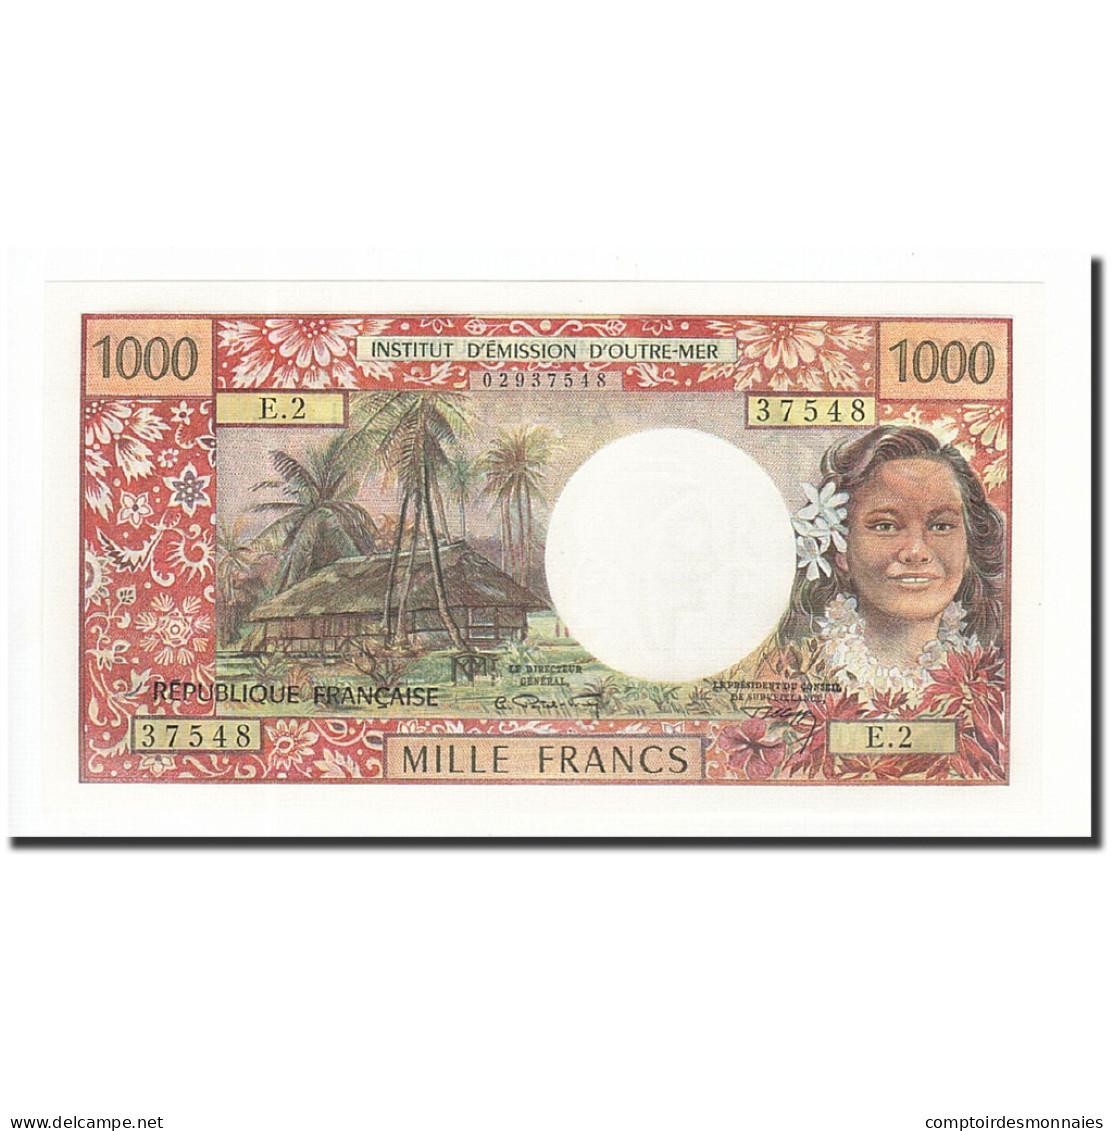 Tahiti, 1000 Francs, 1969-1971, KM:27A, Undated (1971), NEUF - Papeete (Polynésie Française 1914-1985)